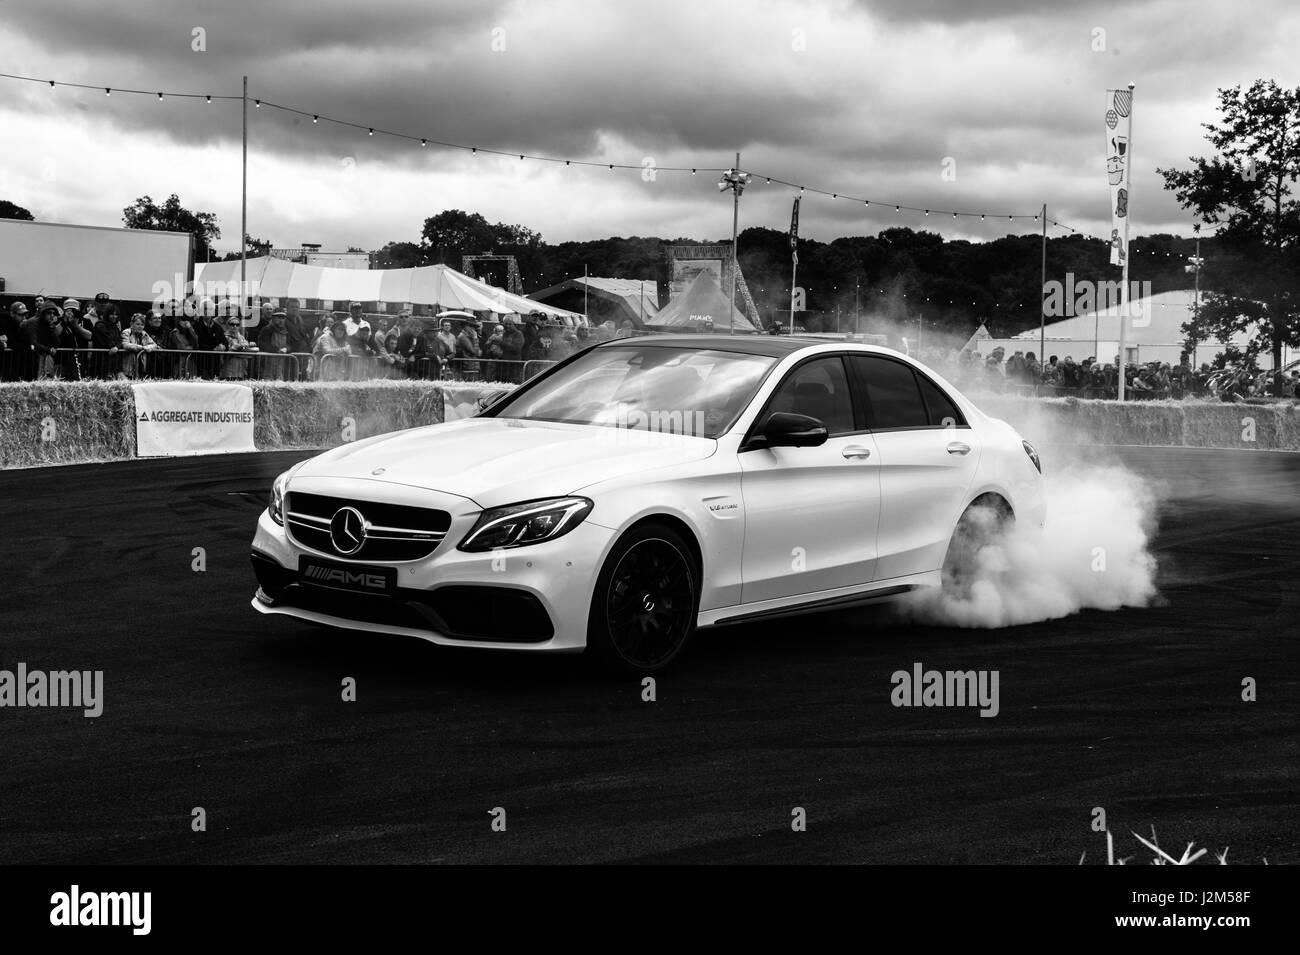 Laverstoke Park Farm, Overton, Basingstoke, Hampshire, United Kingdom. 28 August 2016. Mercedes AMG C63 burnout Stock Photo